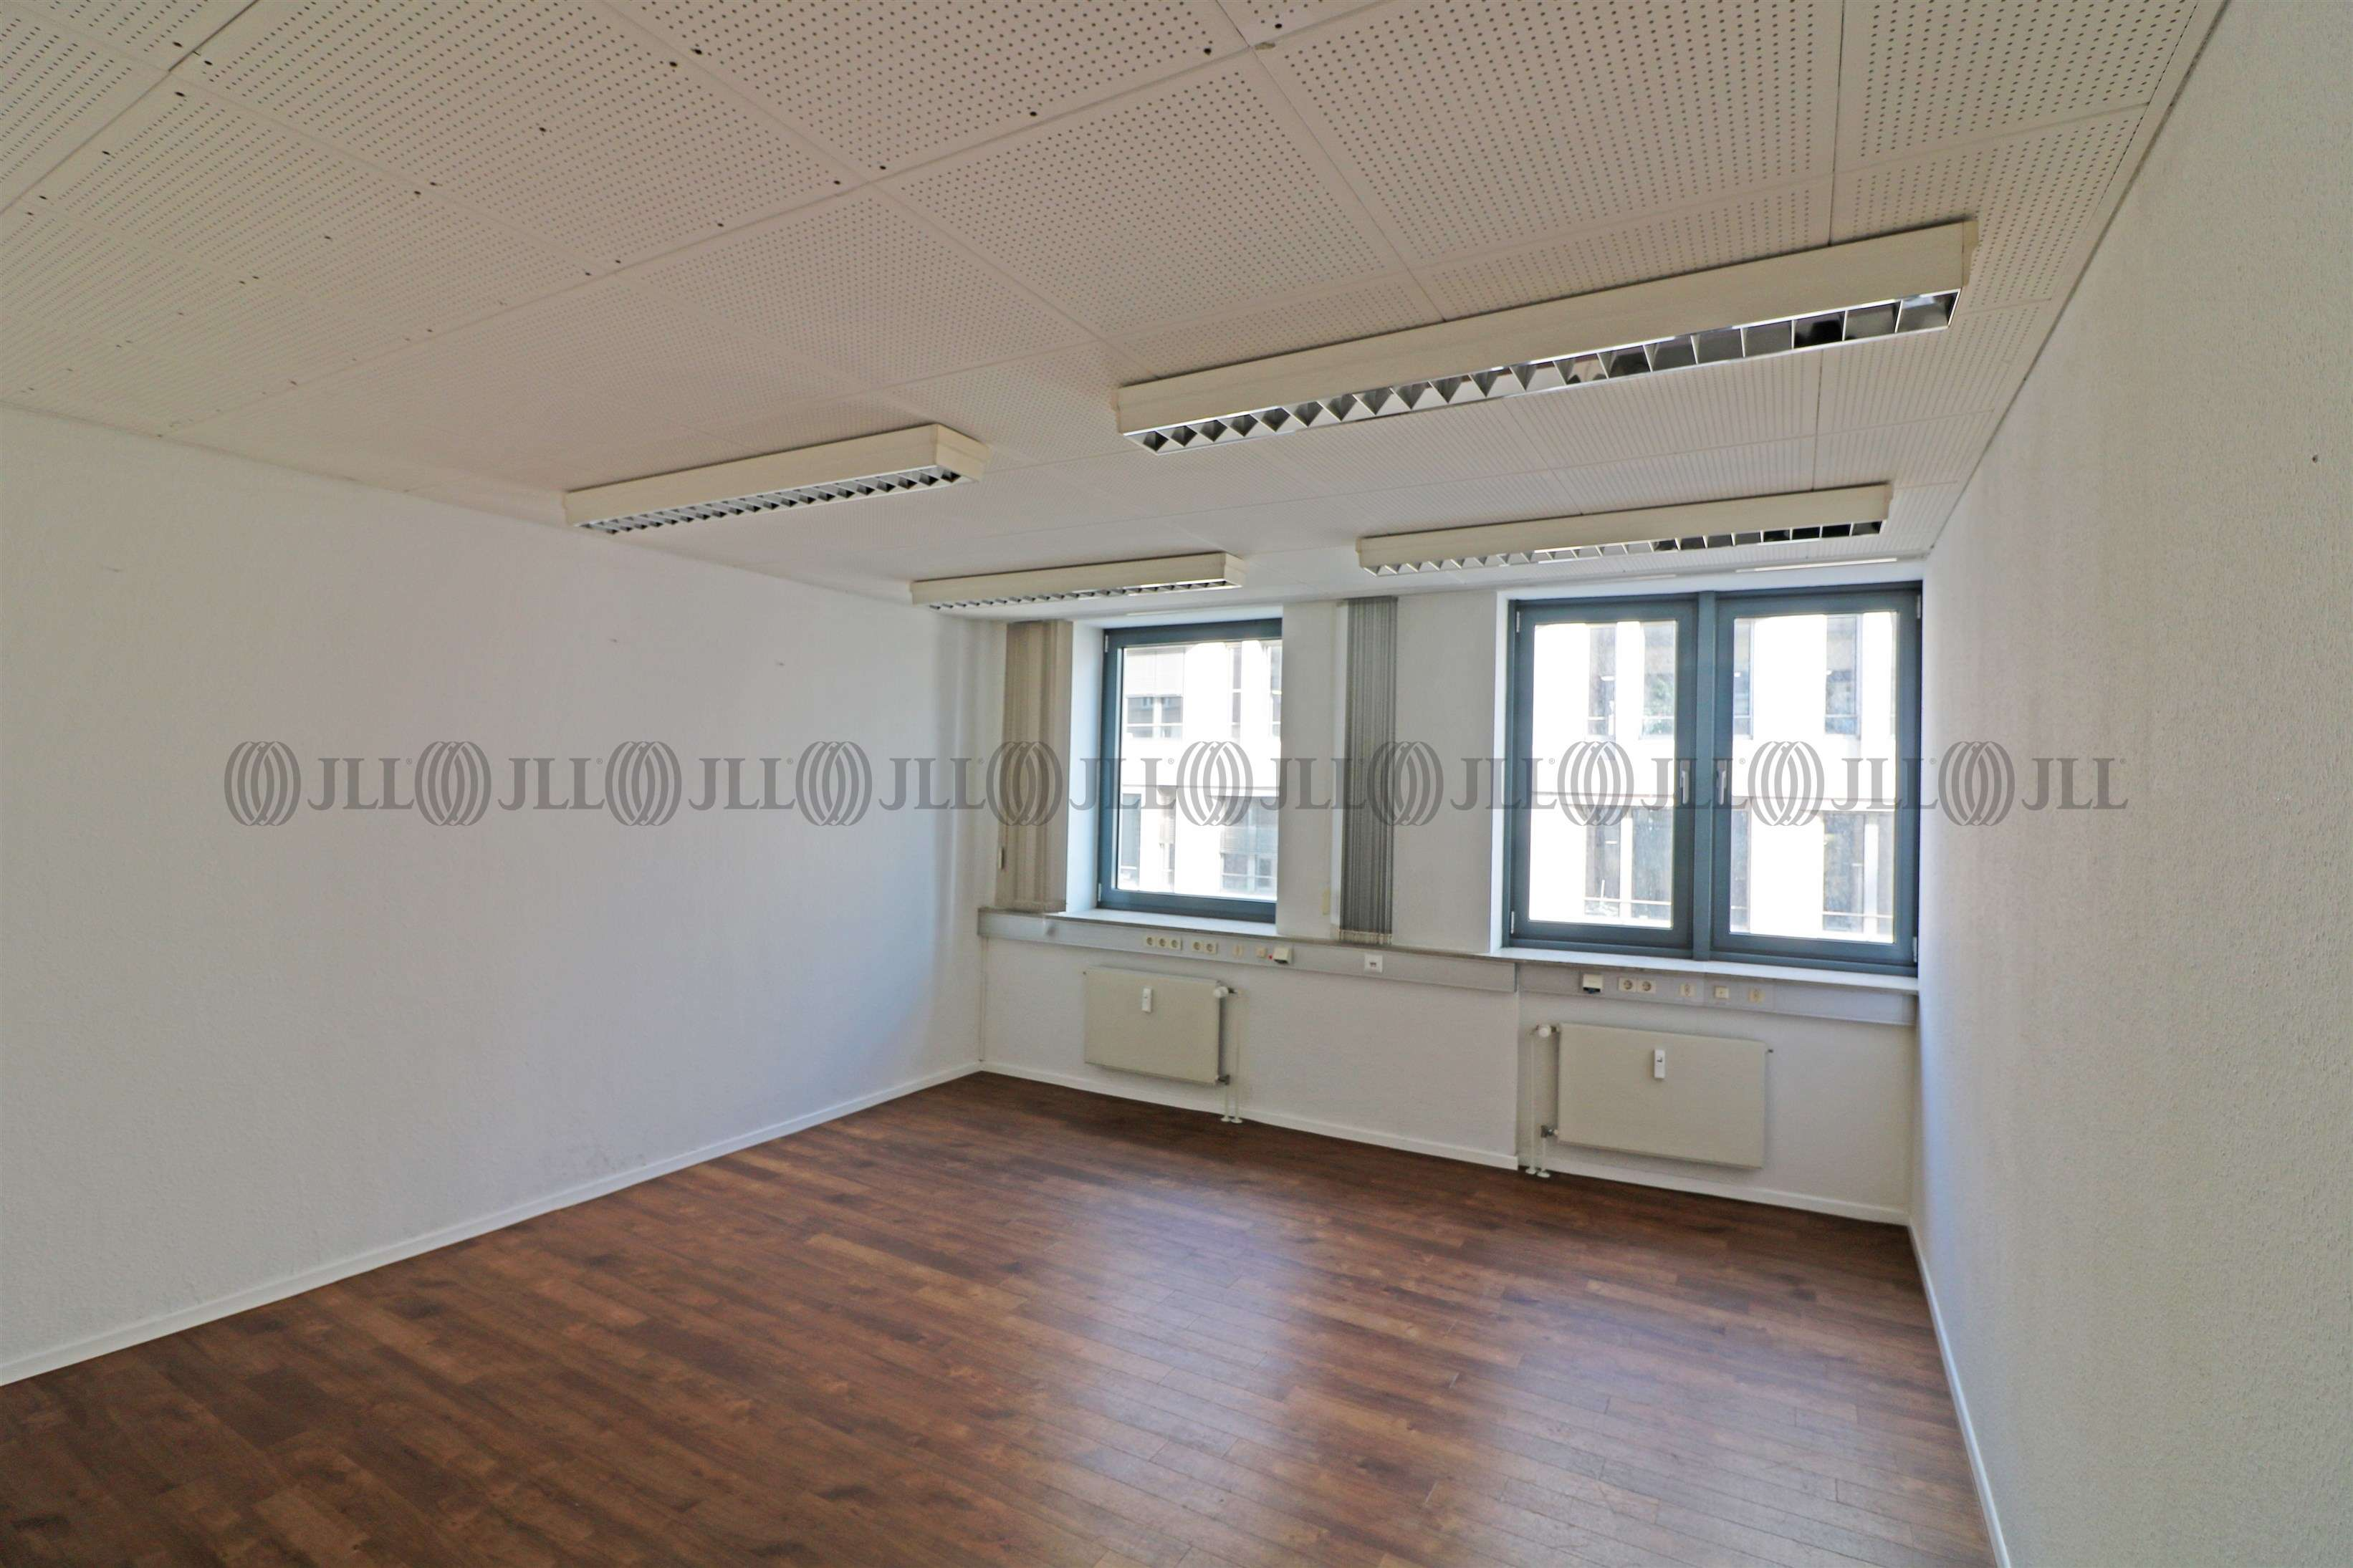 Büros Hamburg, 20457 - Büro - Hamburg, Altstadt - H0137 - 10043882